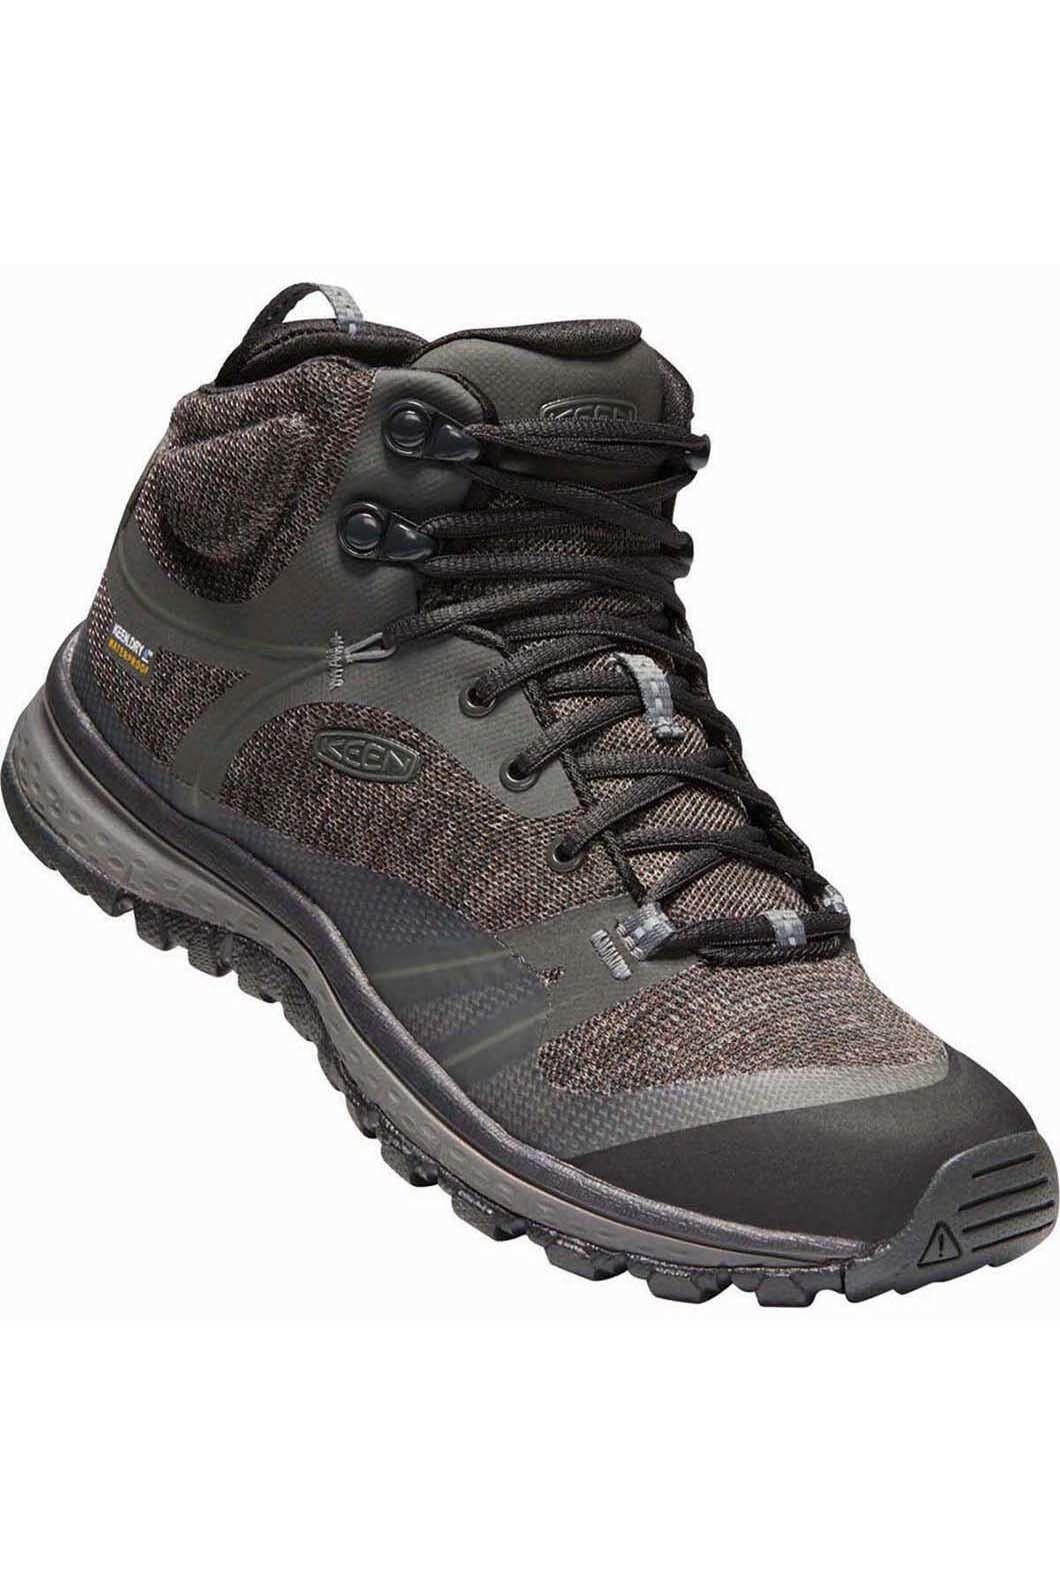 Keen Women's Terradora WP Hiking Boots, Raven/Gargoyle, hi-res